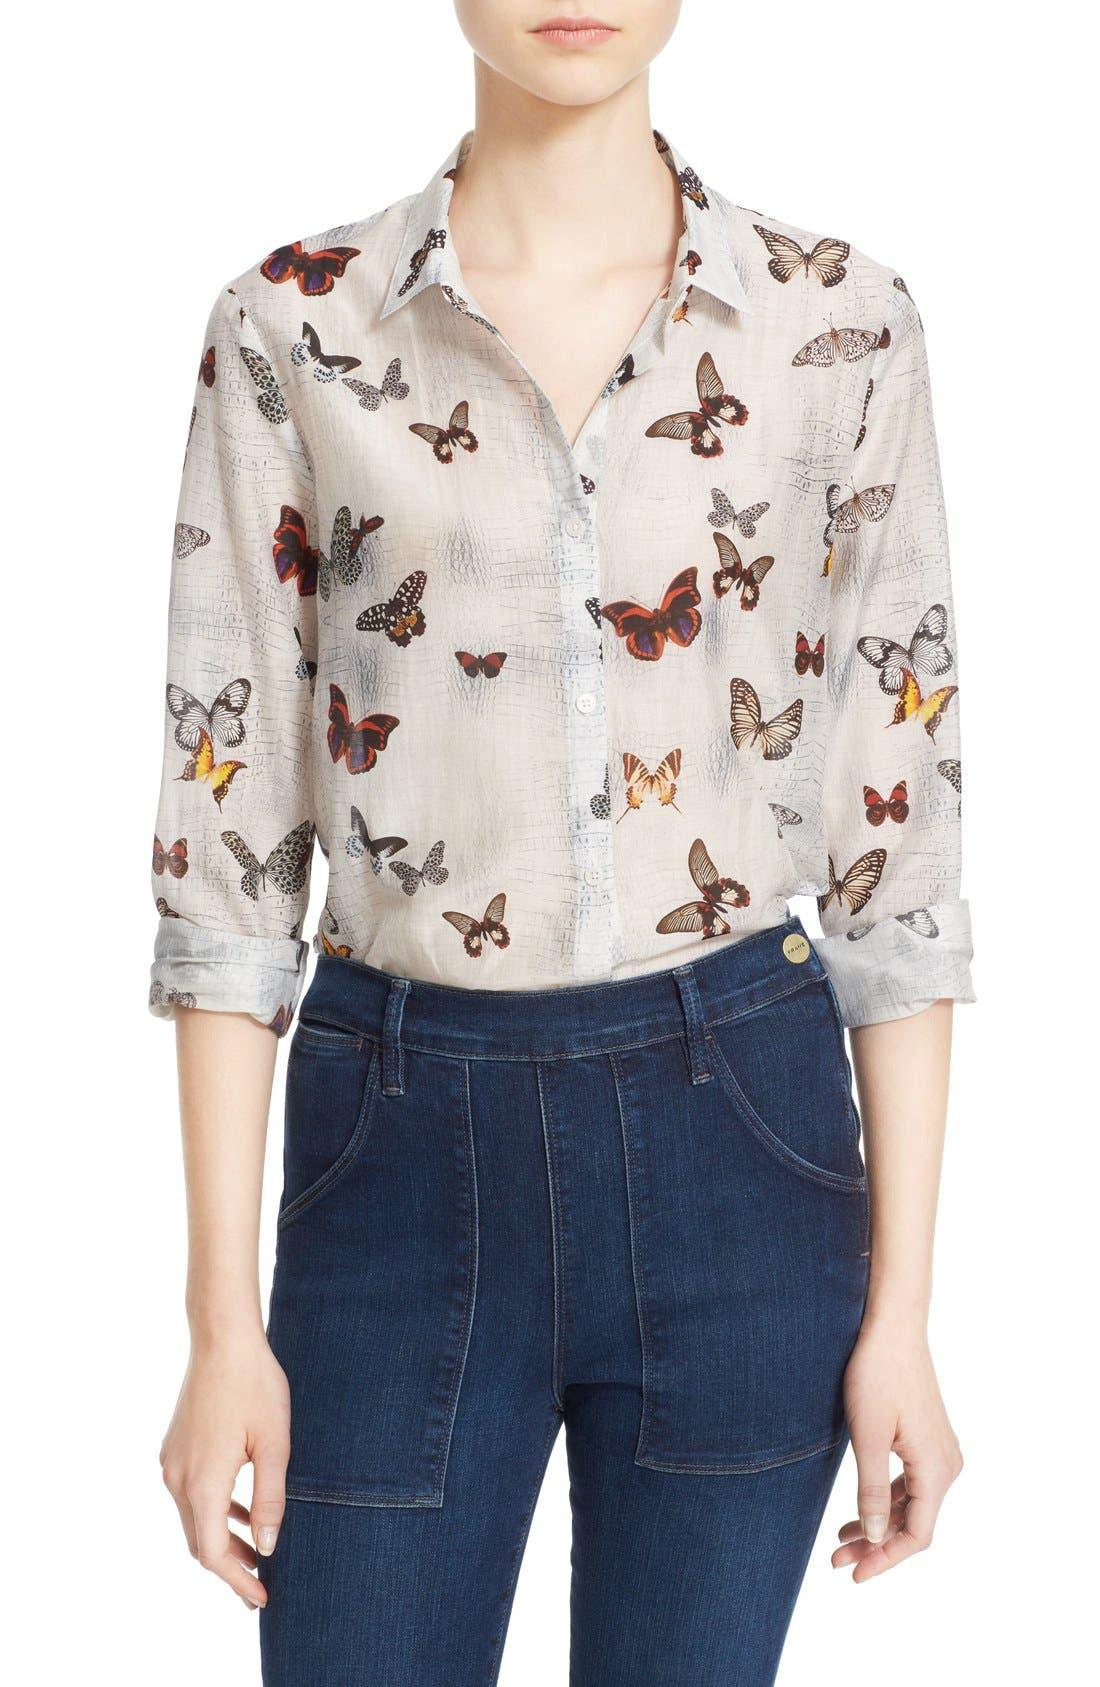 Main Image - The Kooples Butterfly Print Cotton & Silk Shirt